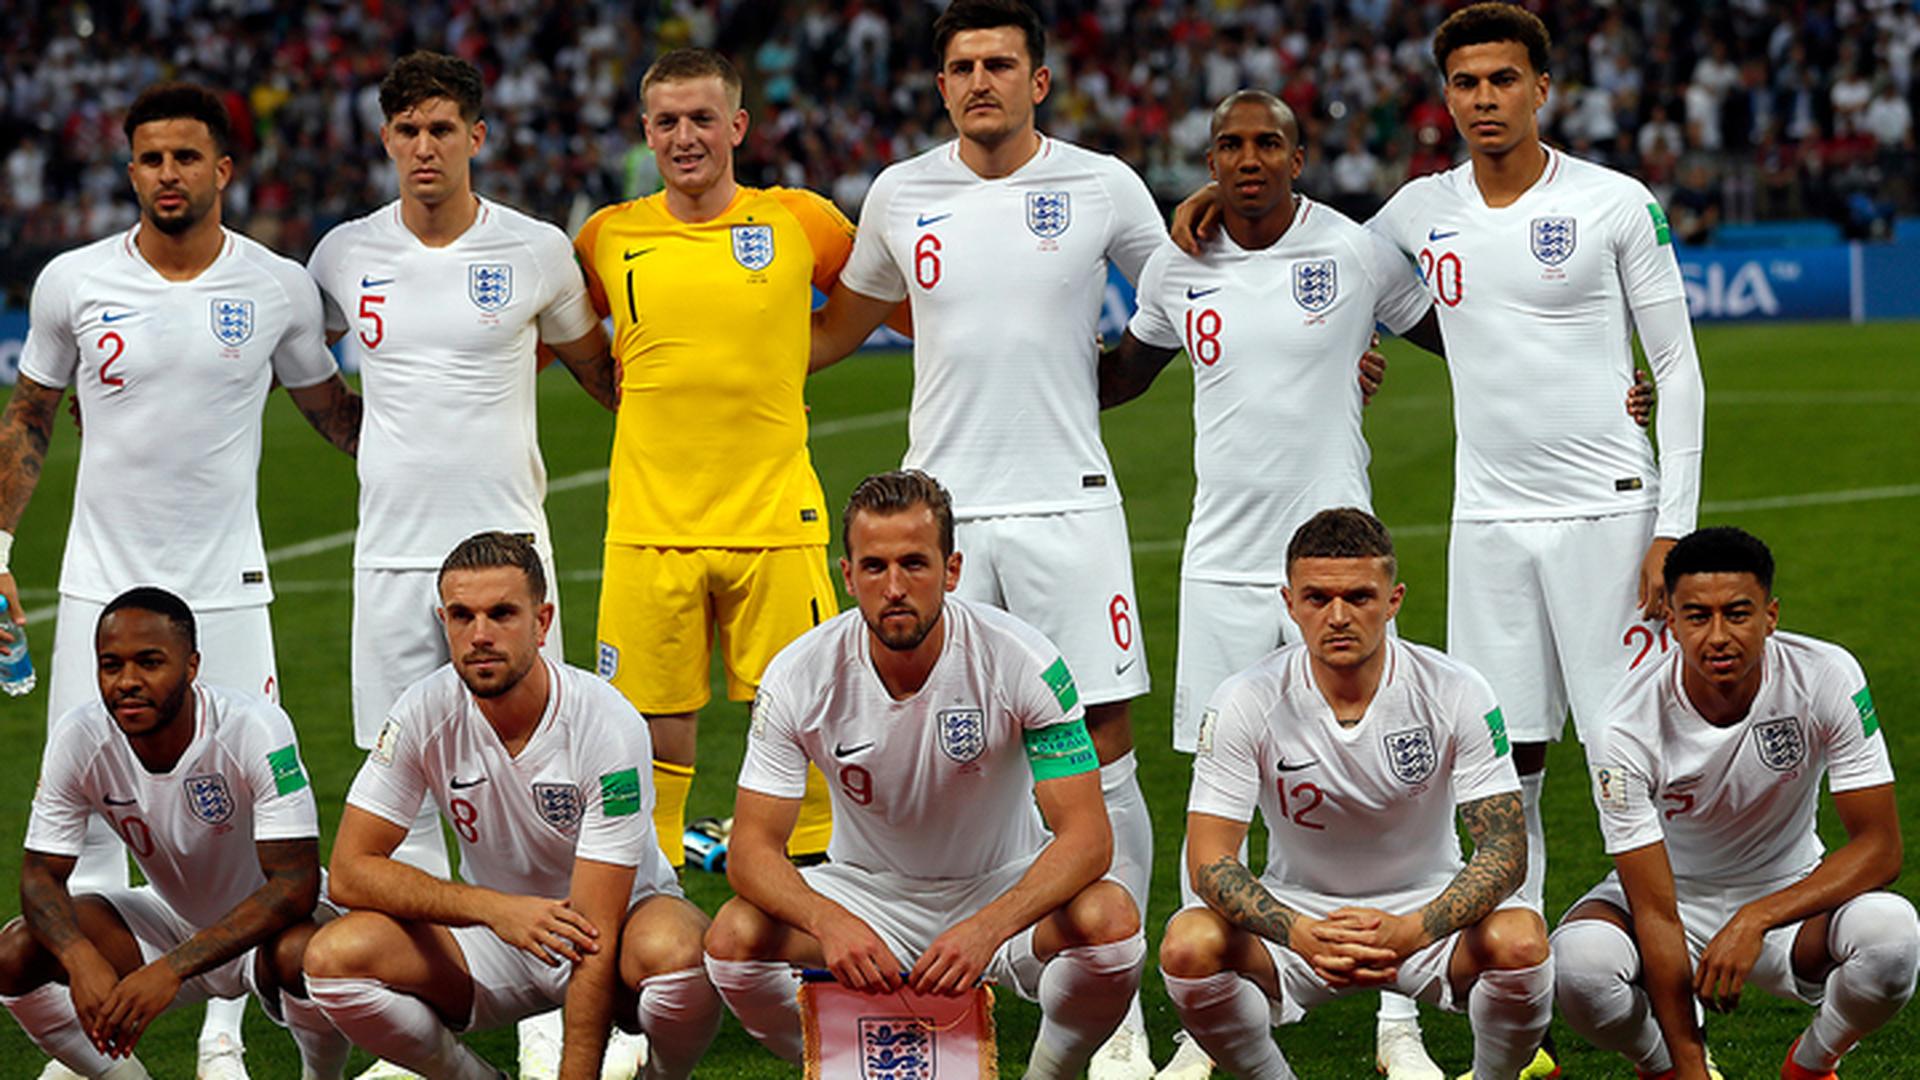 Англия сборная мира футбол